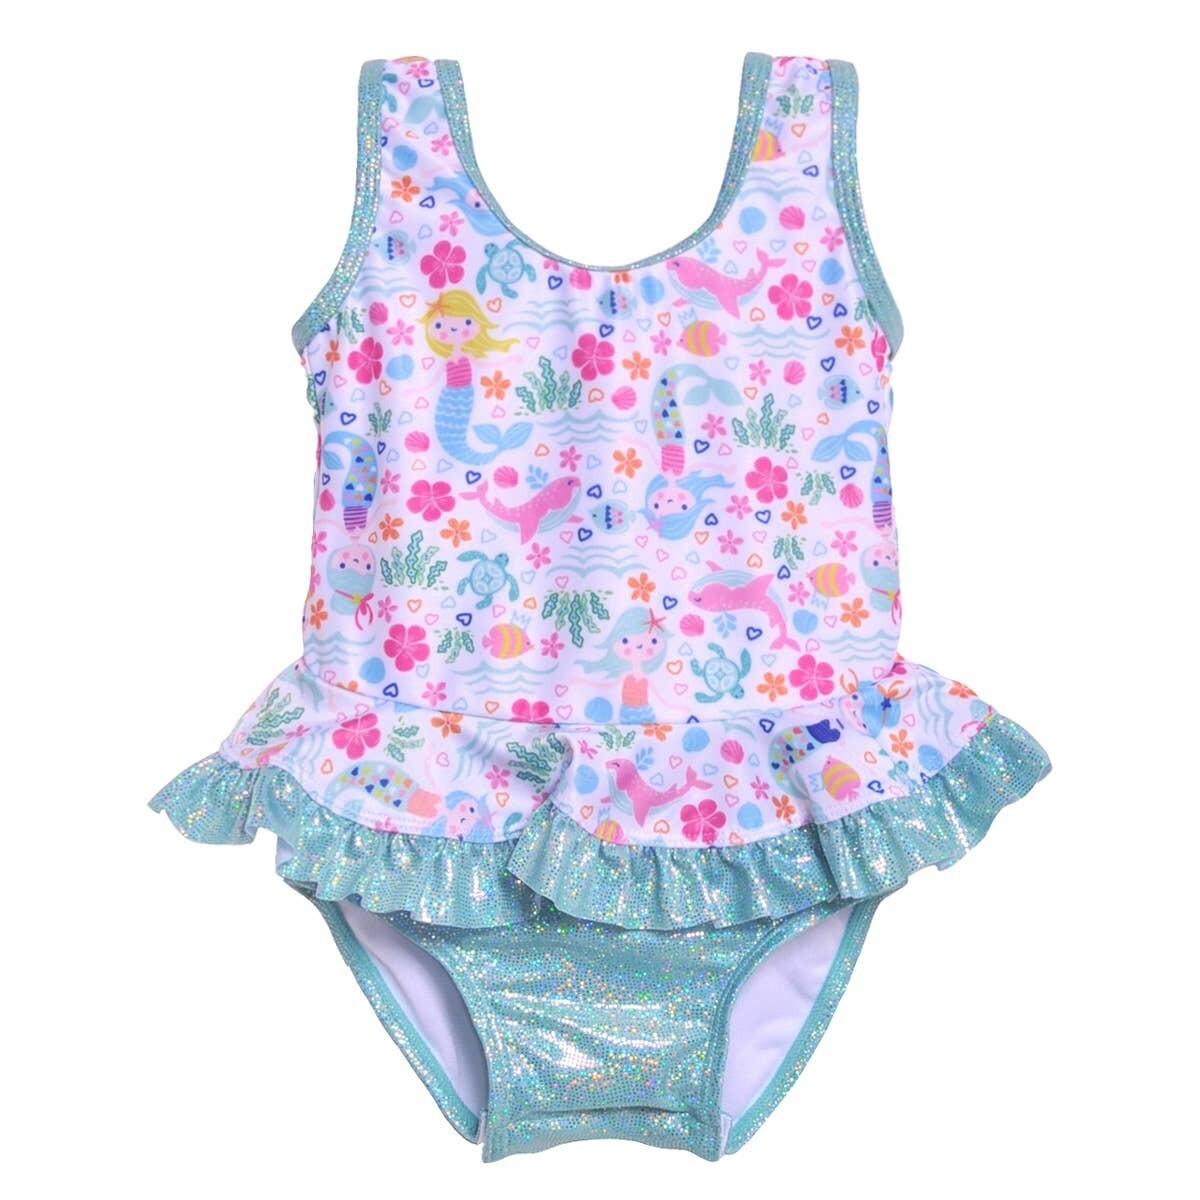 Flap Happy Stella Swimsuit - Mermaid Lagoon